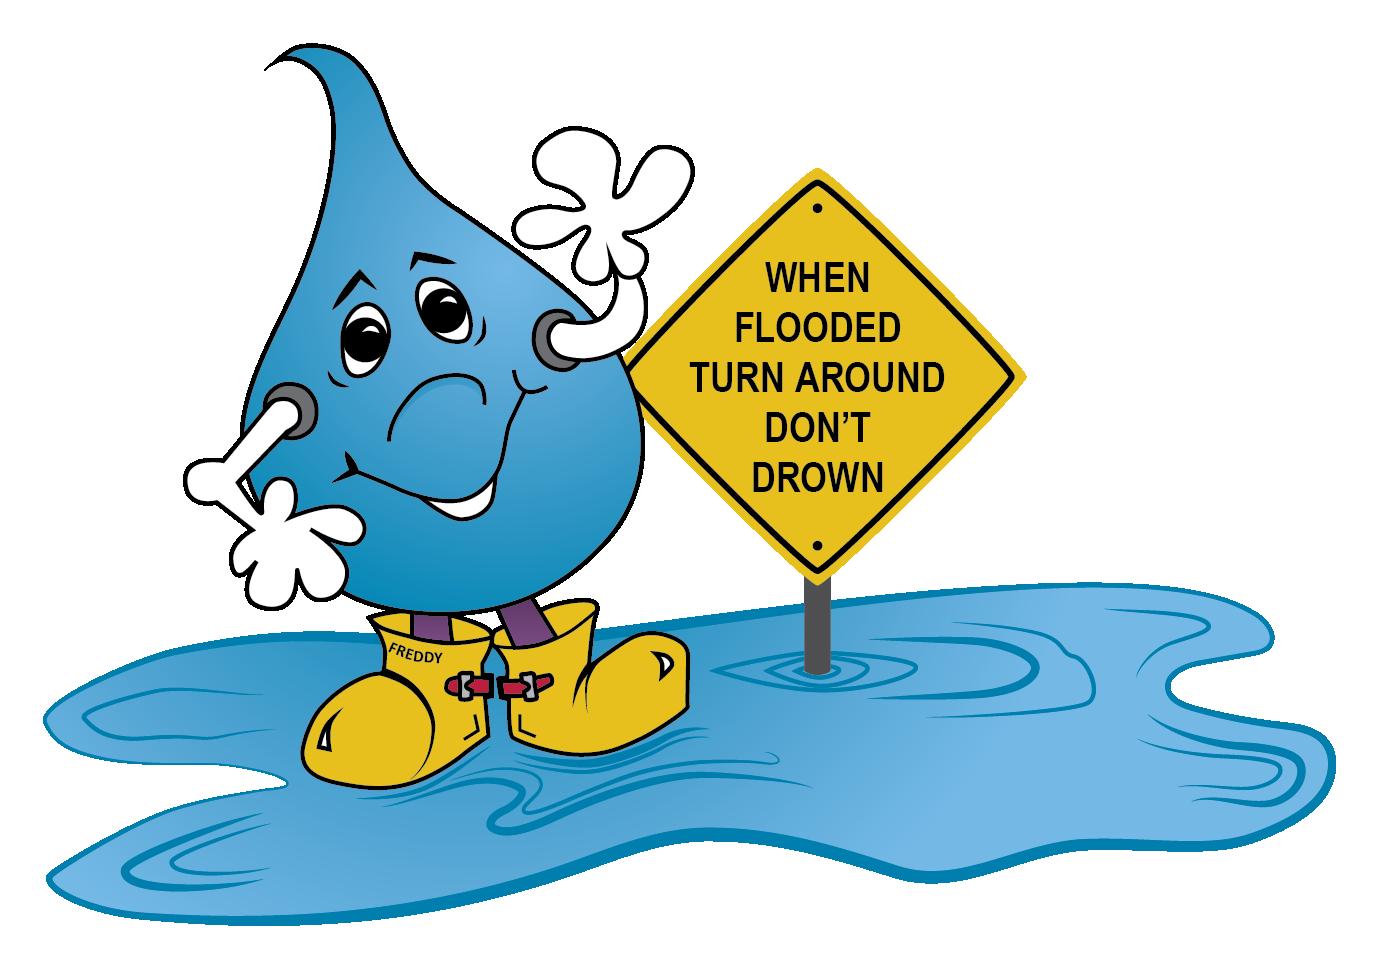 Flood clipart flash flood. Tadd sign program turn